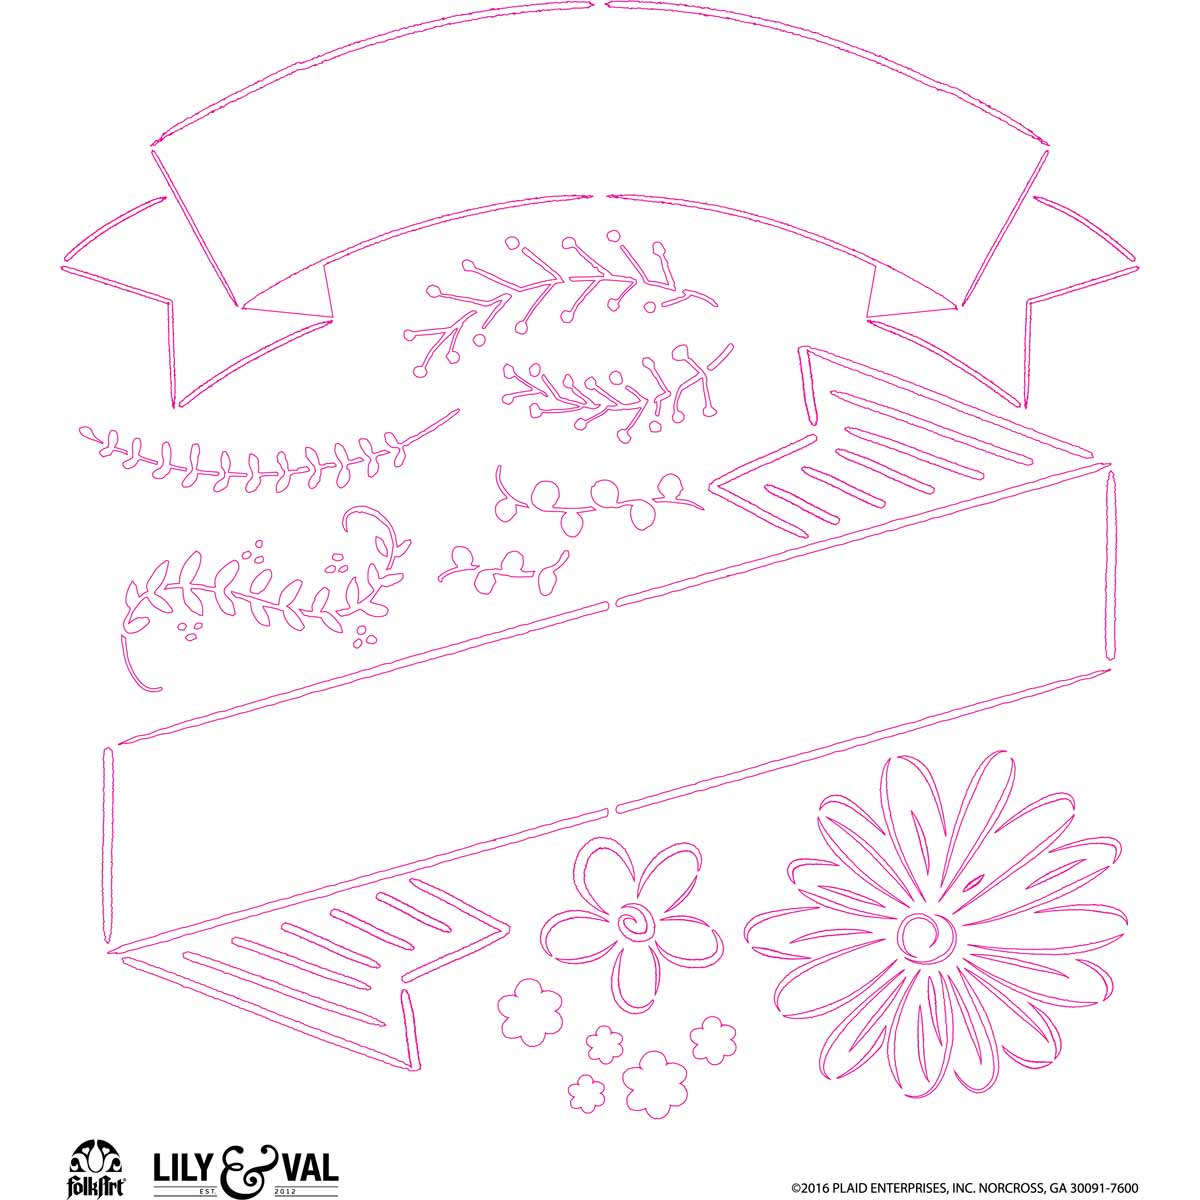 FolkArt ® Lily & Val™ Stencils - Variety Packs - Mixed Fonts - 13238